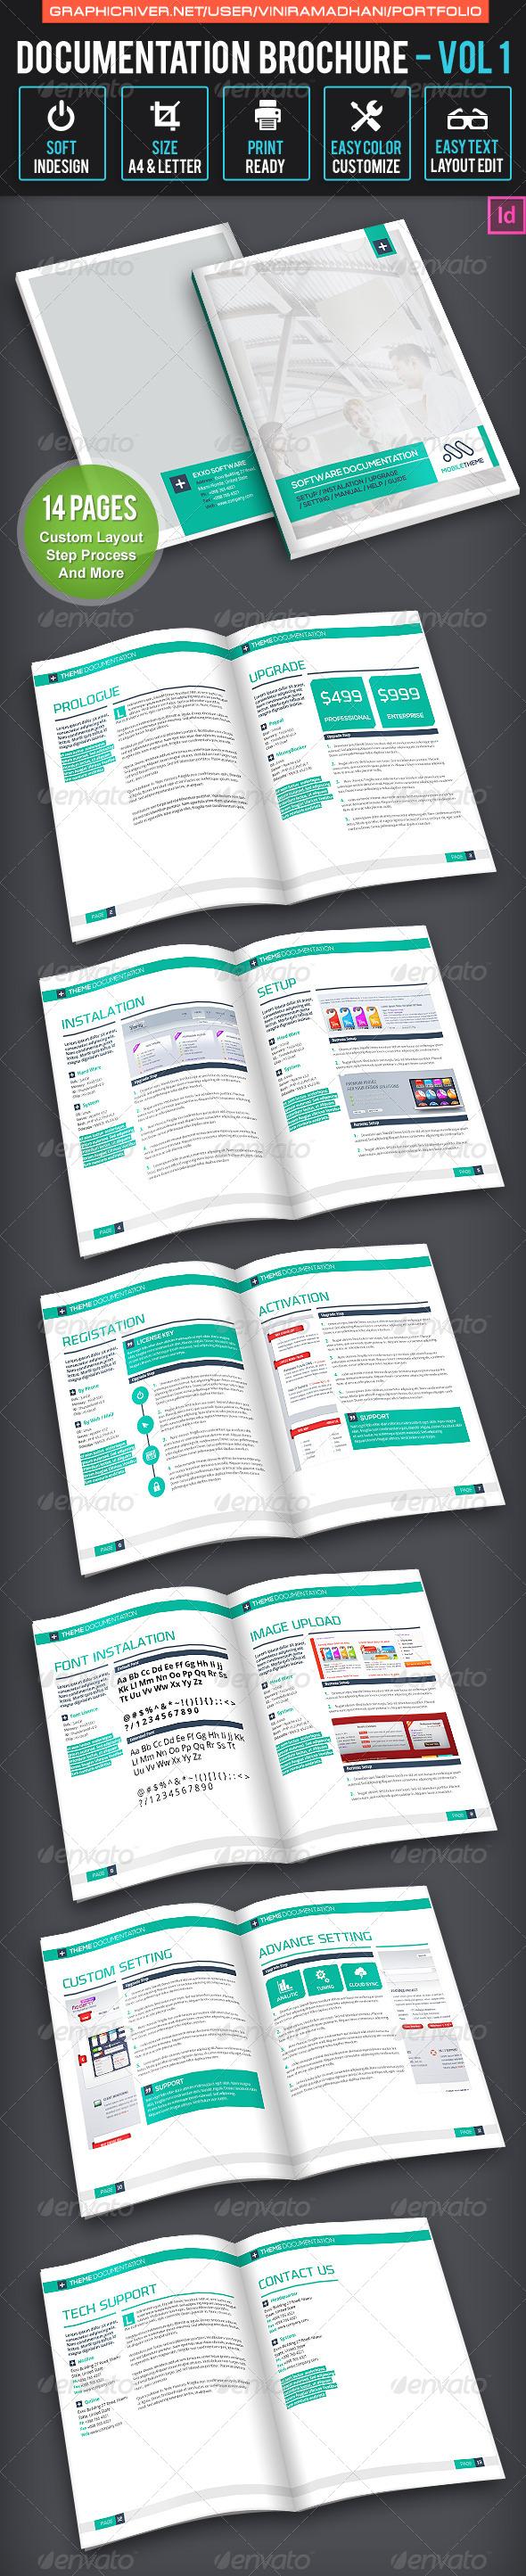 Documentation Brochure | Volume 1 - Informational Brochures